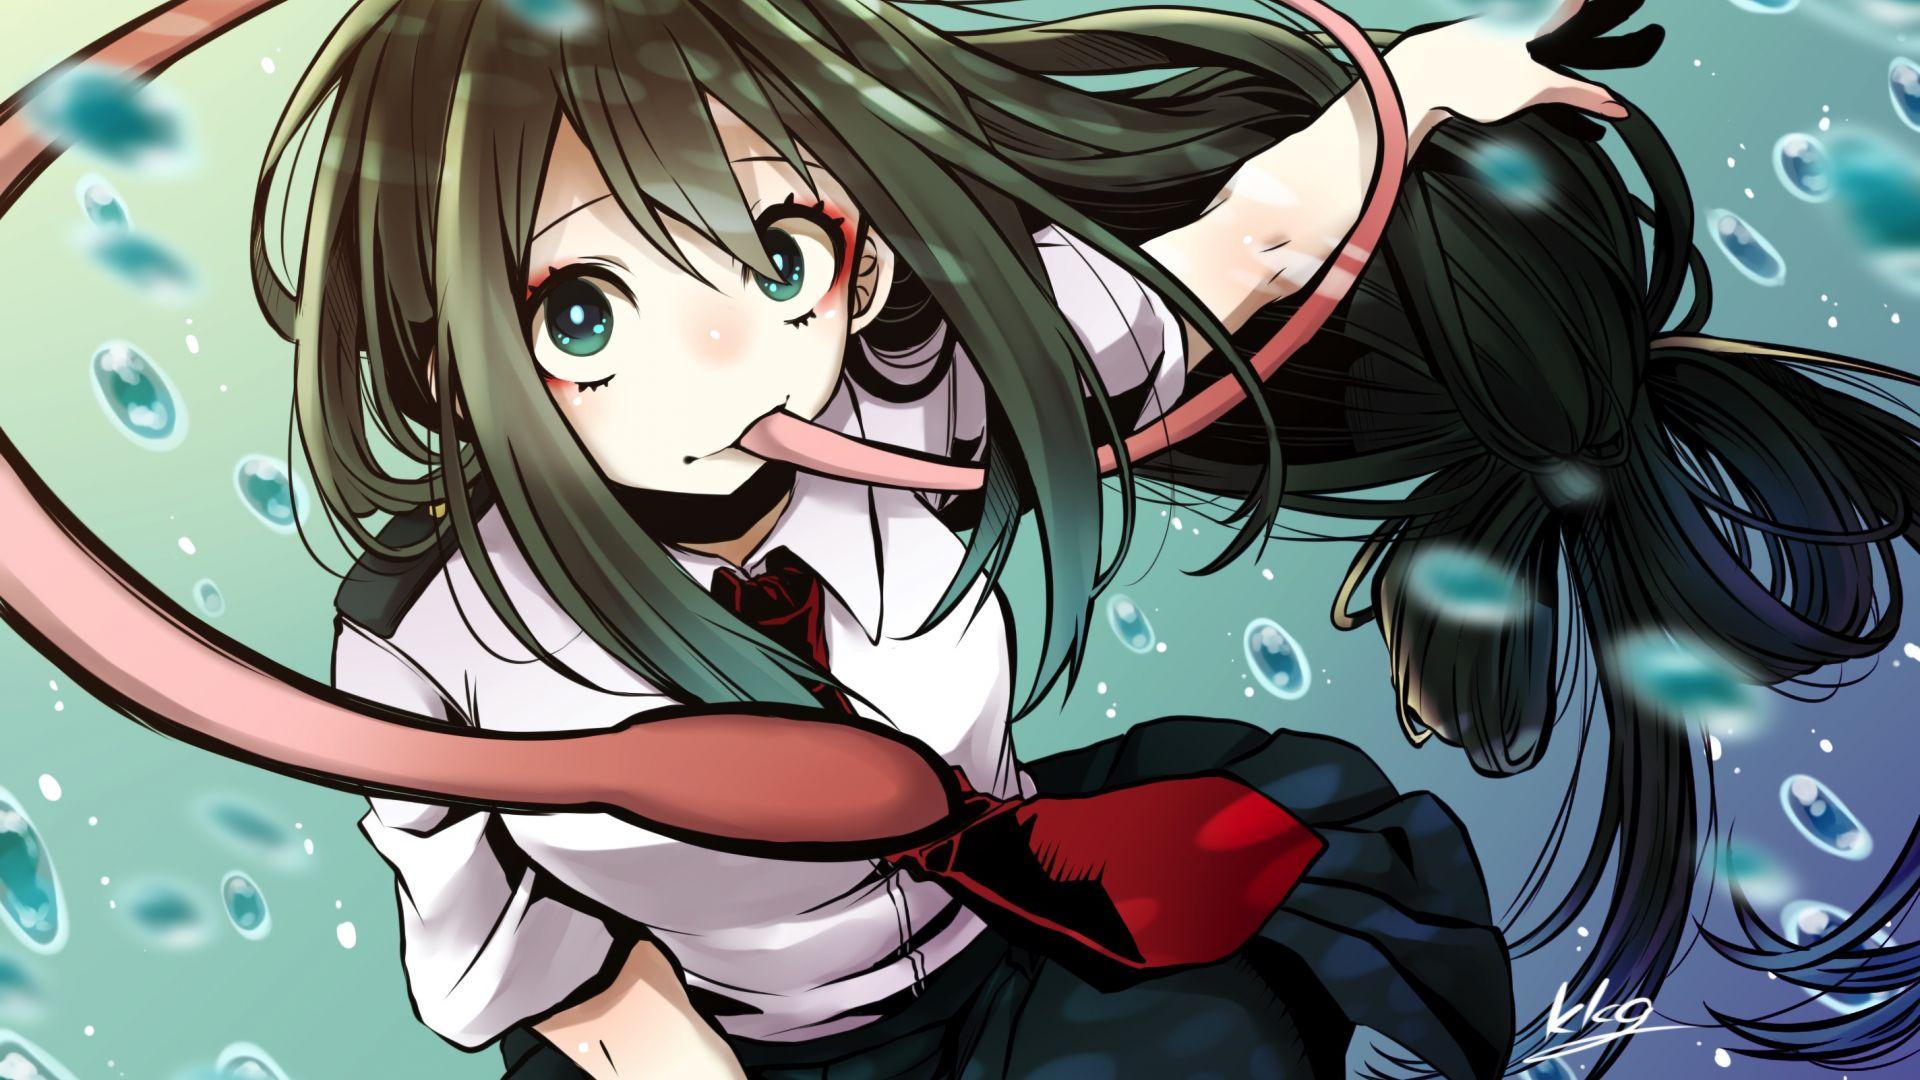 Desktop Wallpaper Anime Girl, Cute, Tsuyu Asui, Hd Image ...